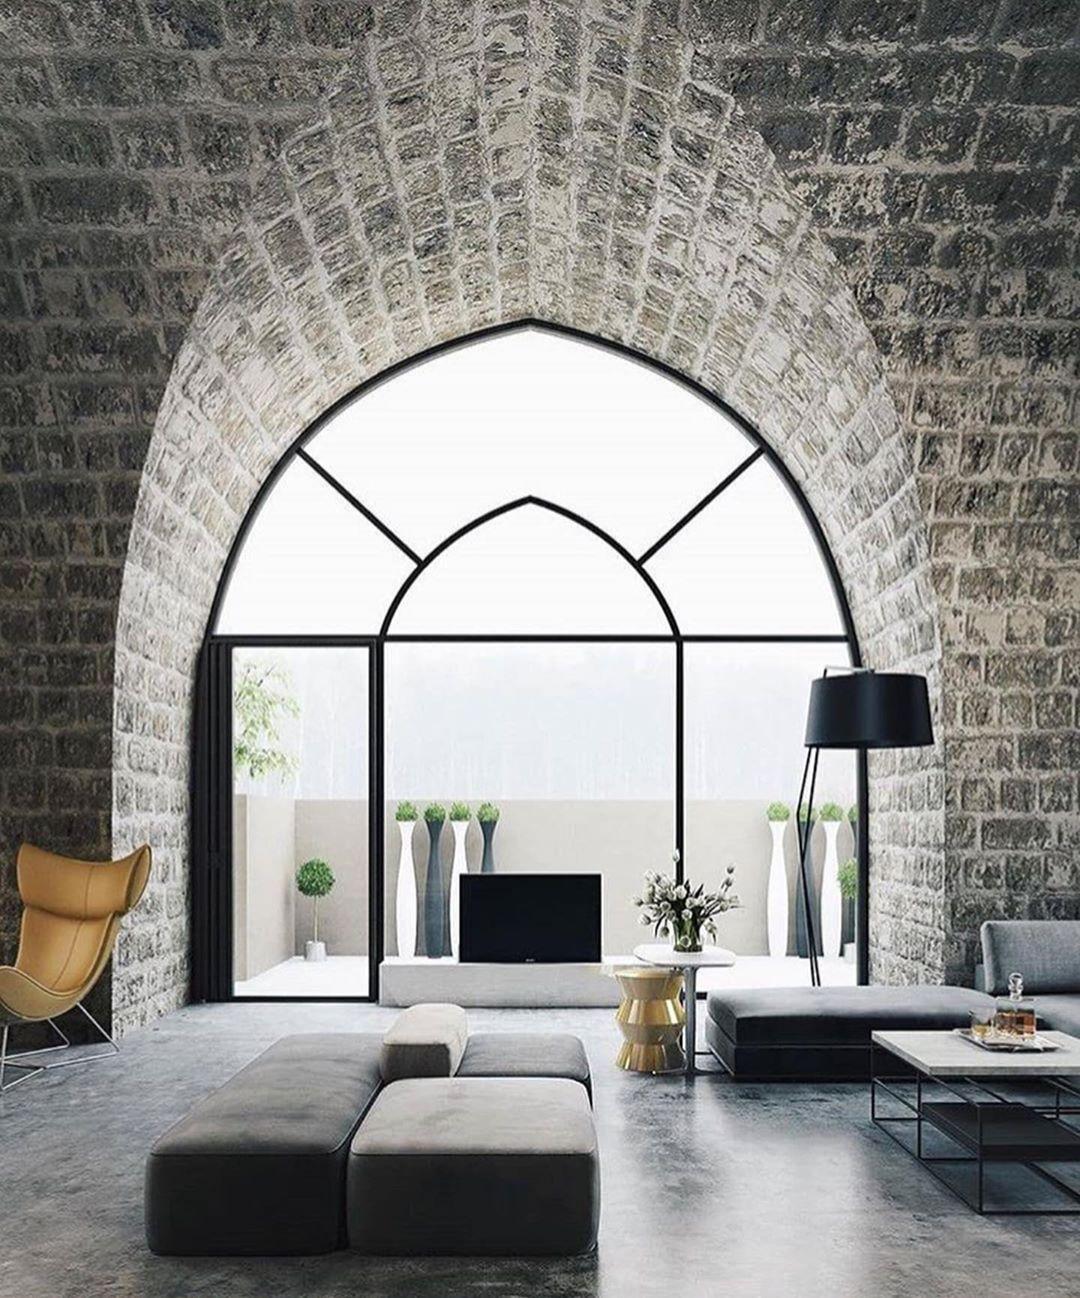 Instagram Da Art Architecture Magazine What Do You Think